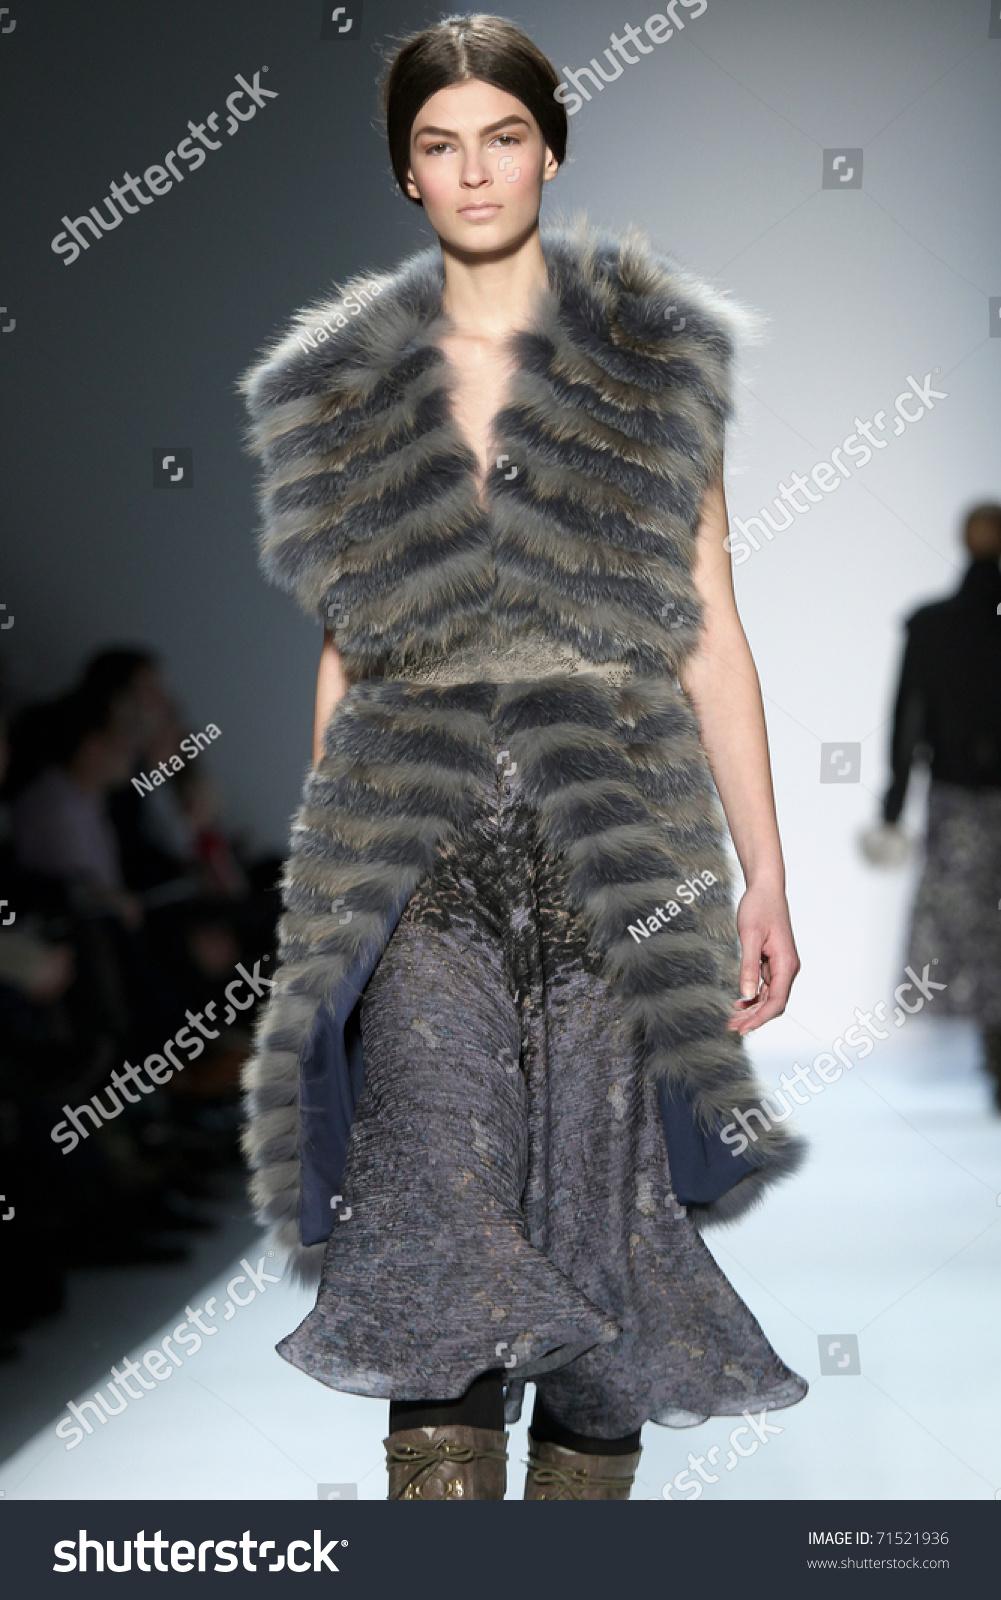 Fashion style Cota christian fall winter for woman